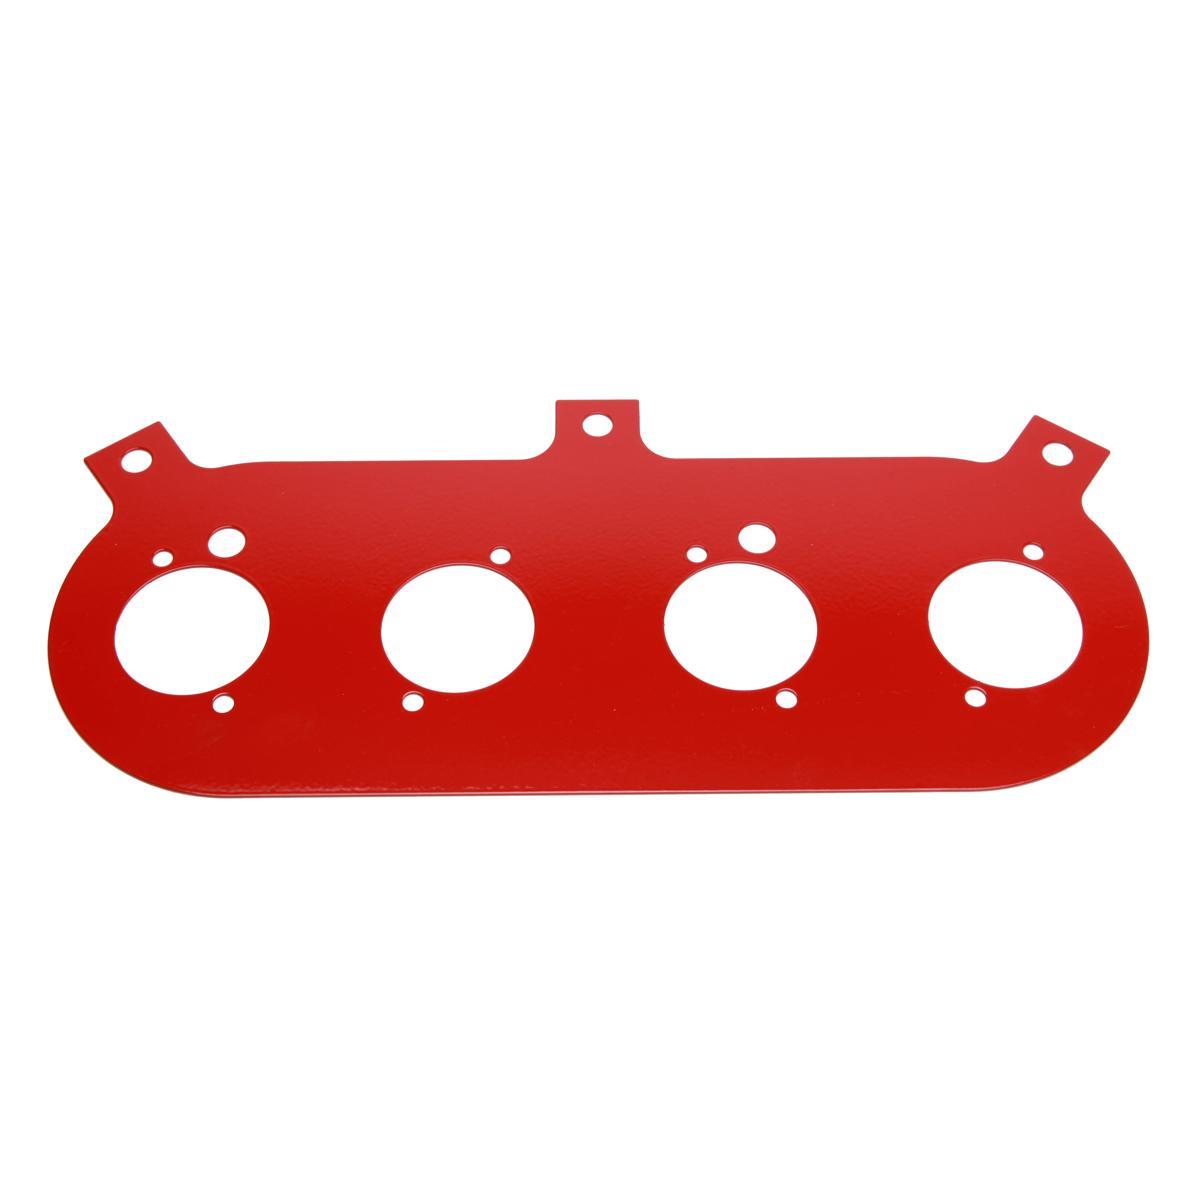 Base plate 16 valve vauxhall itg 13jc40 merlin motorsport for Motor base plate design